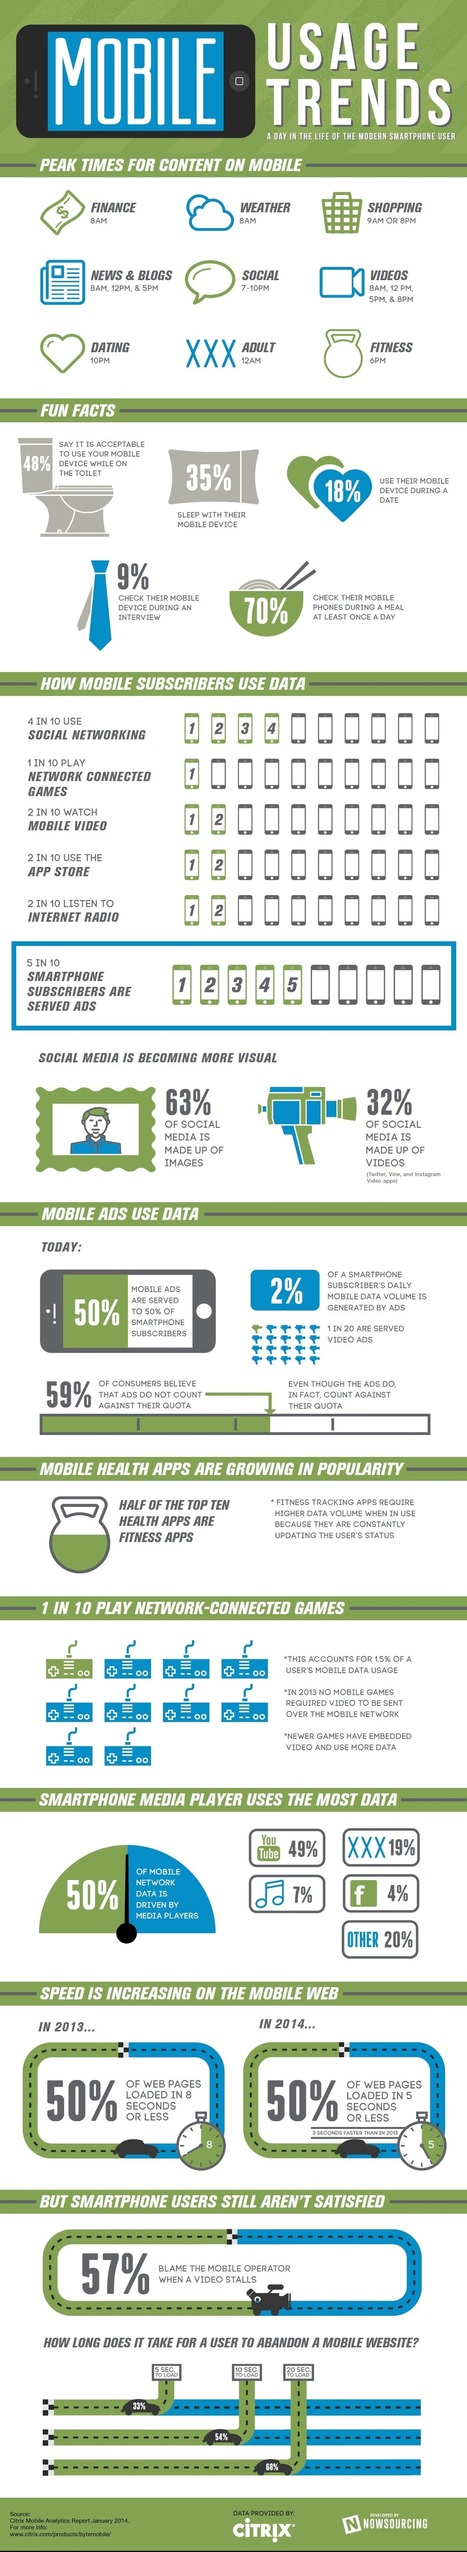 Mobile Marketing : Optimisations Images et Vidéos en 2014 | Design | Scoop.it